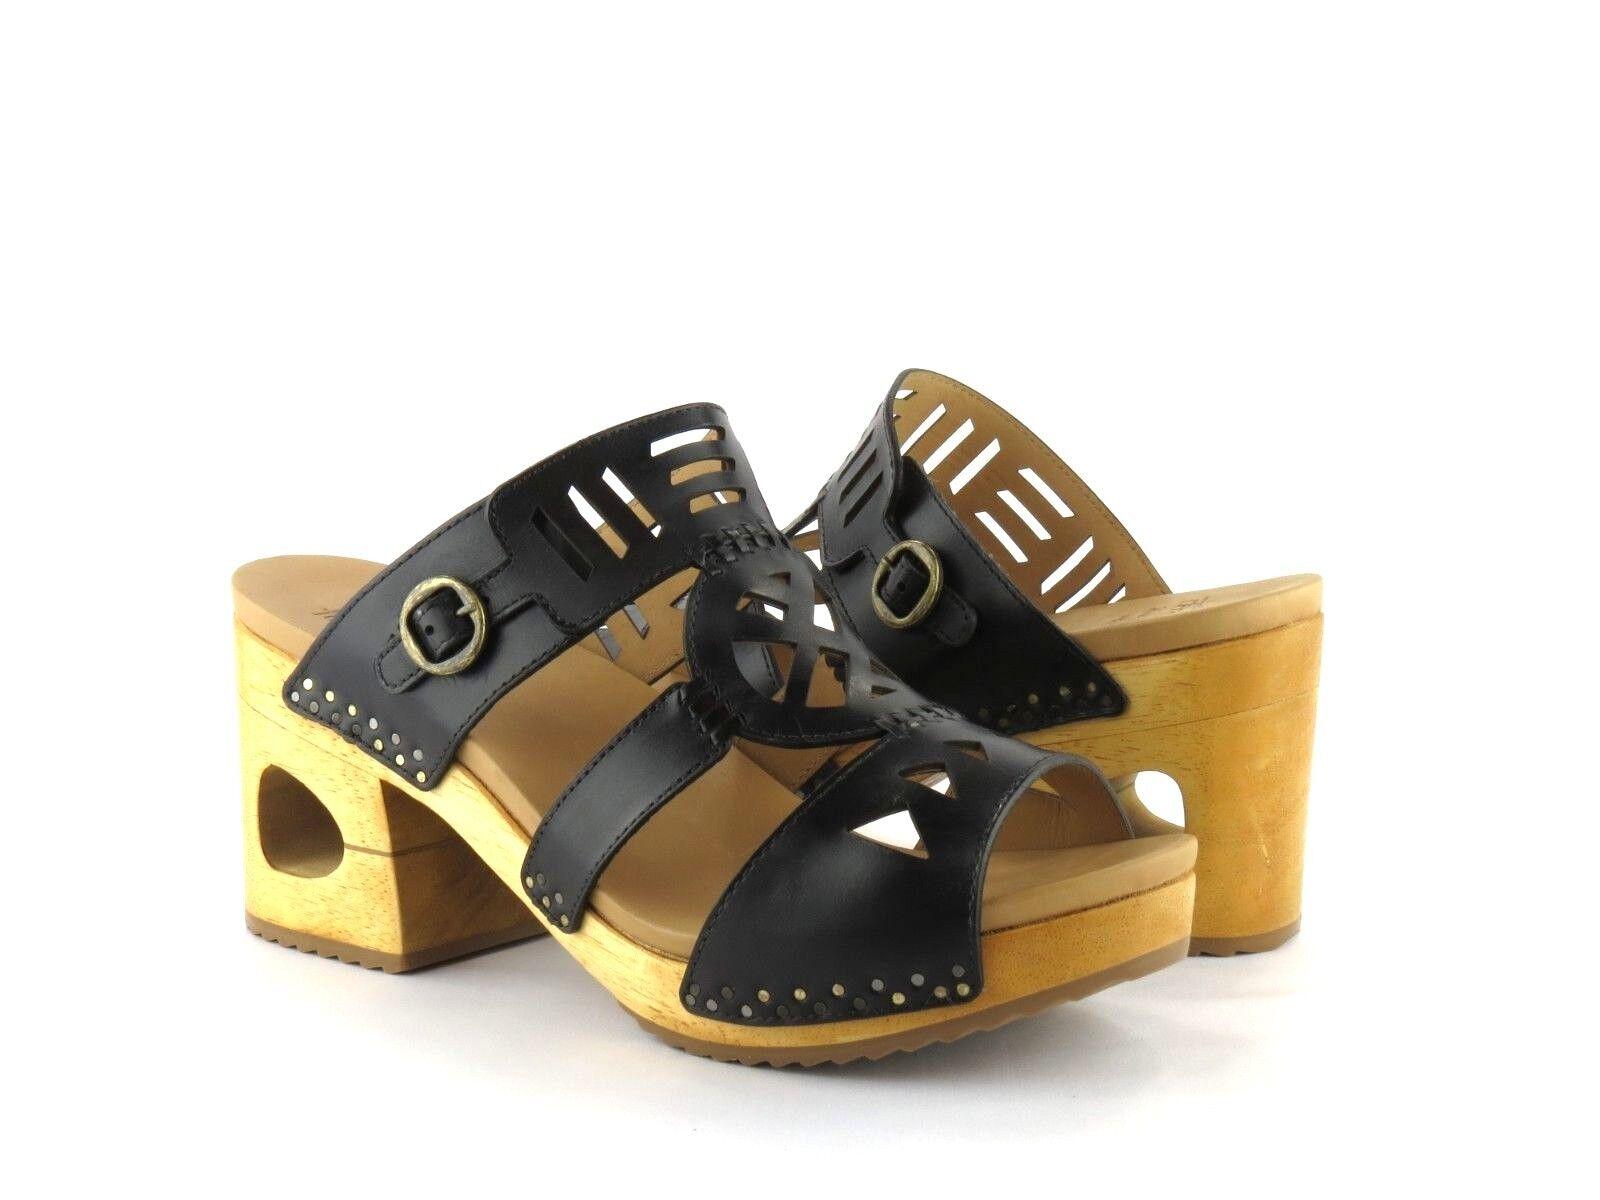 Dansko Oralee nero nero nero Waxy Full Grain Leather Cutout Peep Toe Block Heel Sandal 40 e5e43b